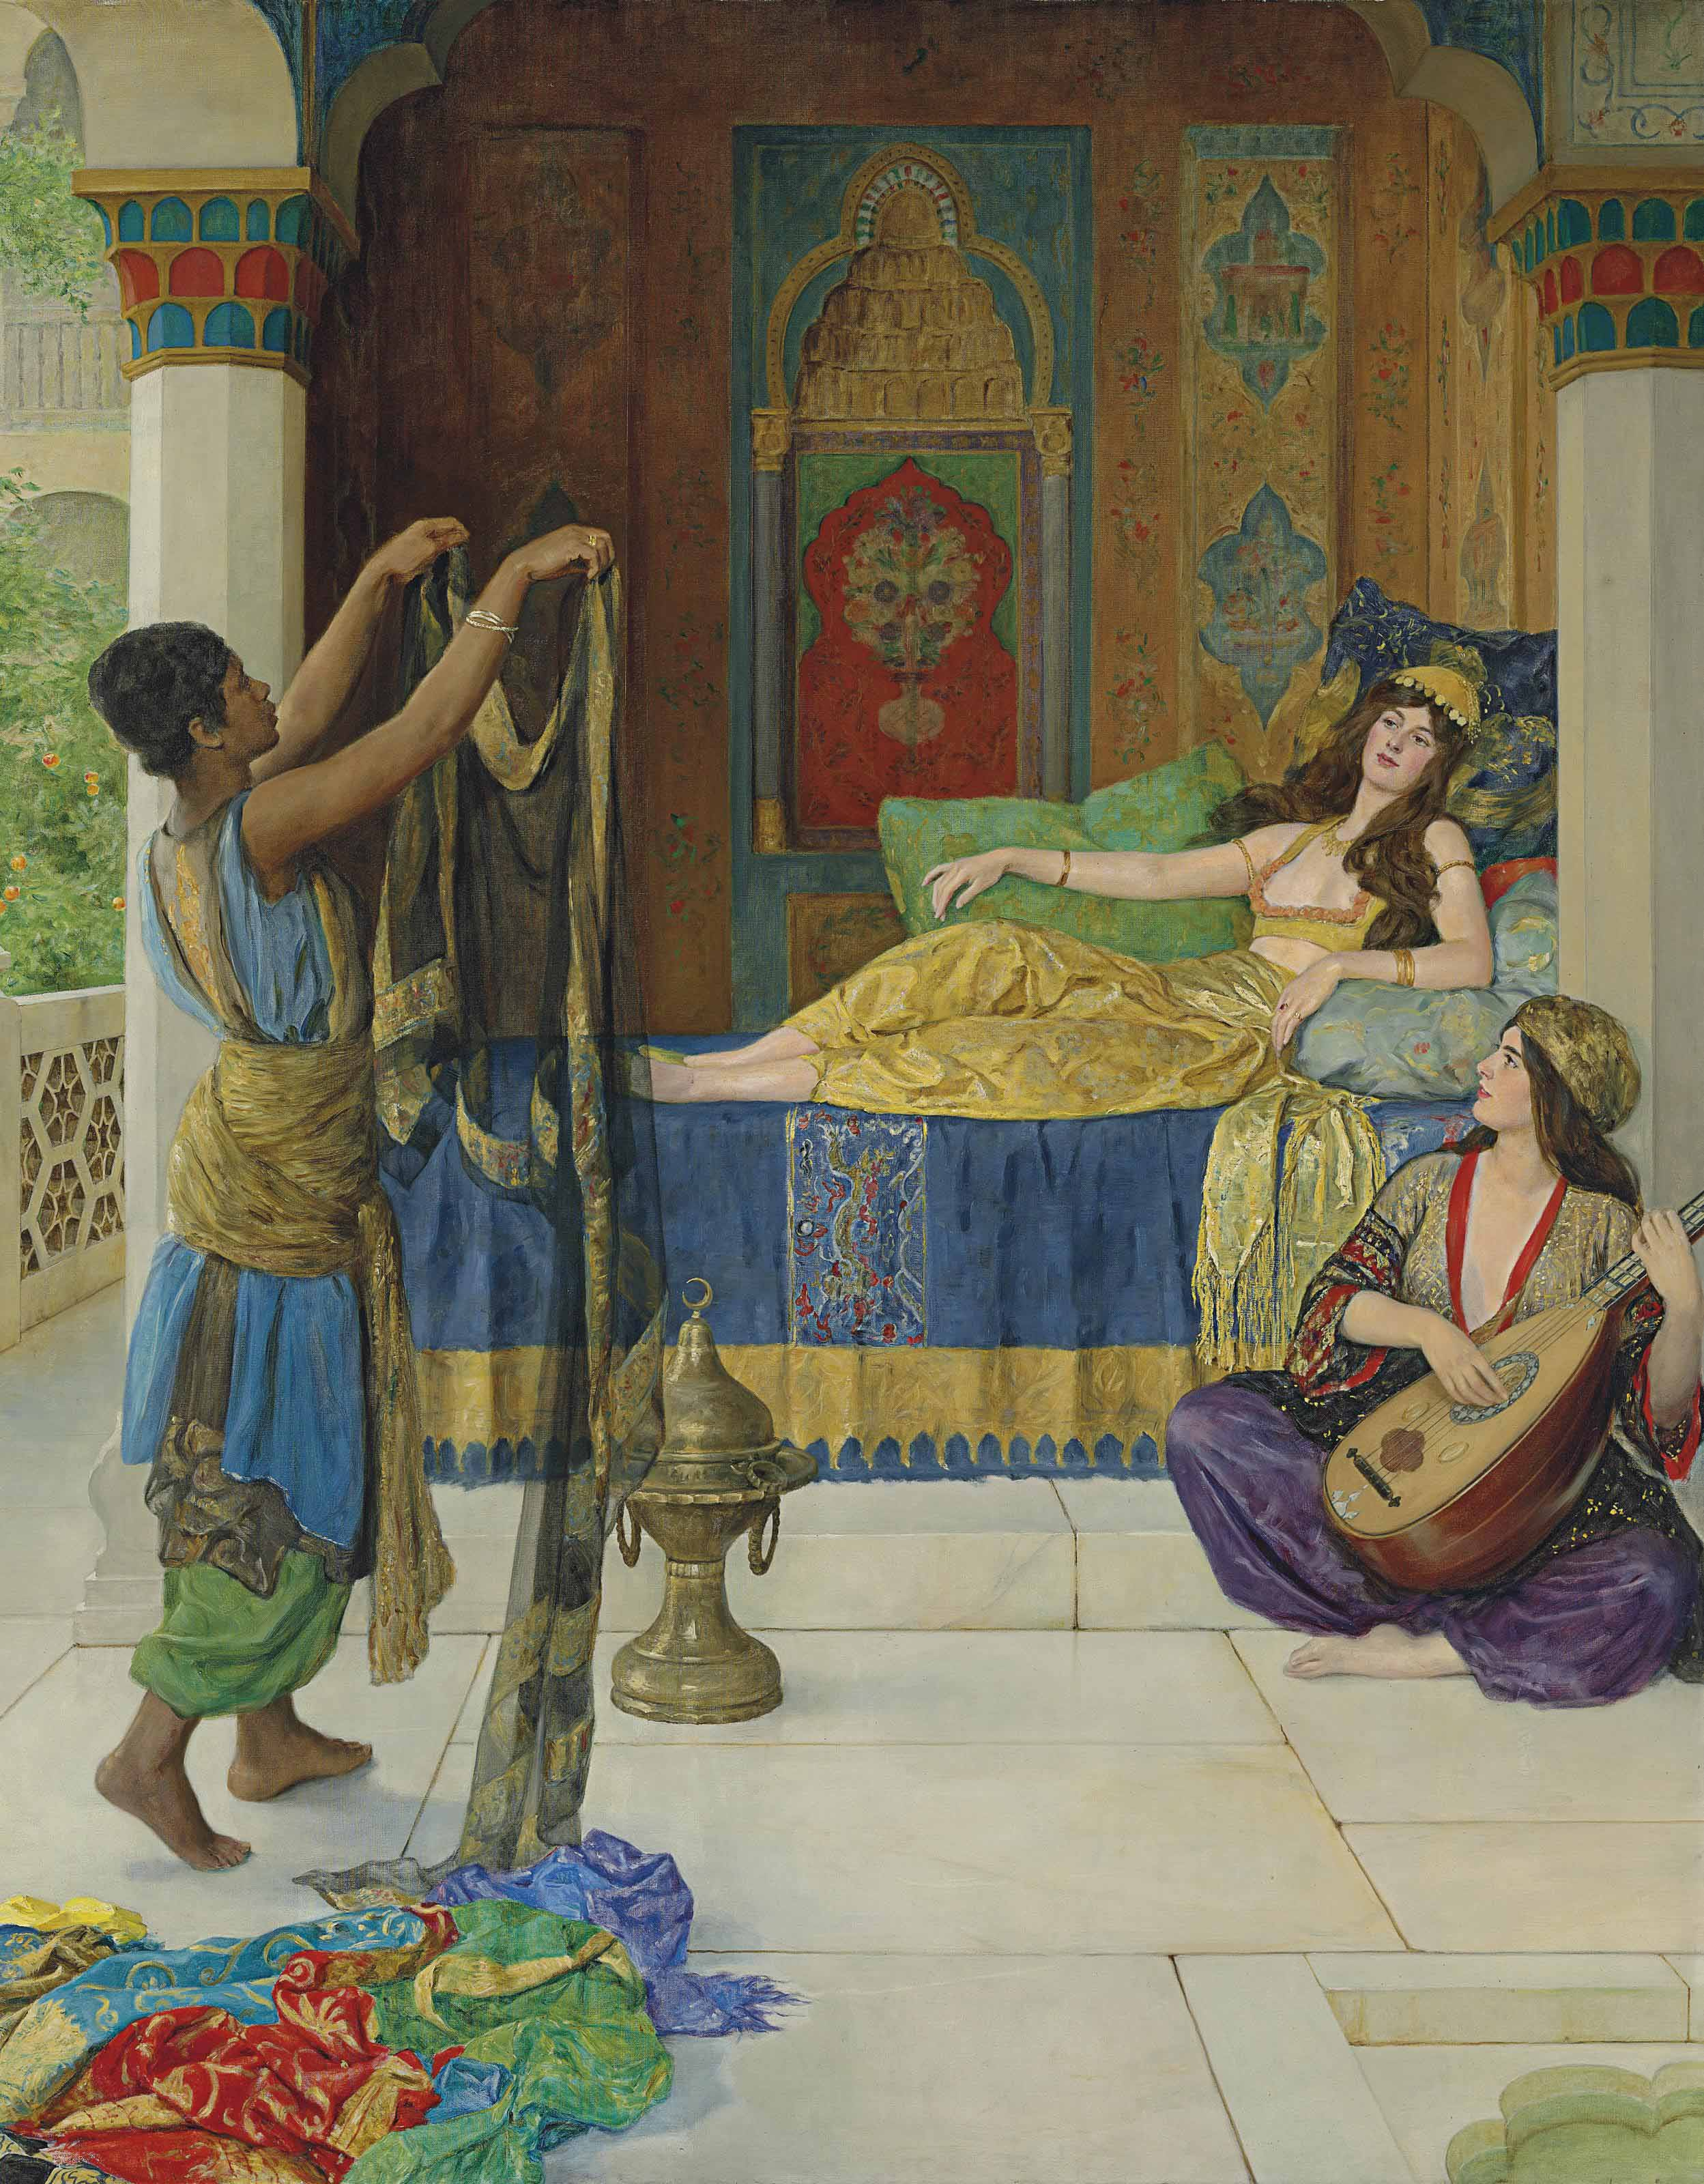 Myrrh, Aloes and Cassia